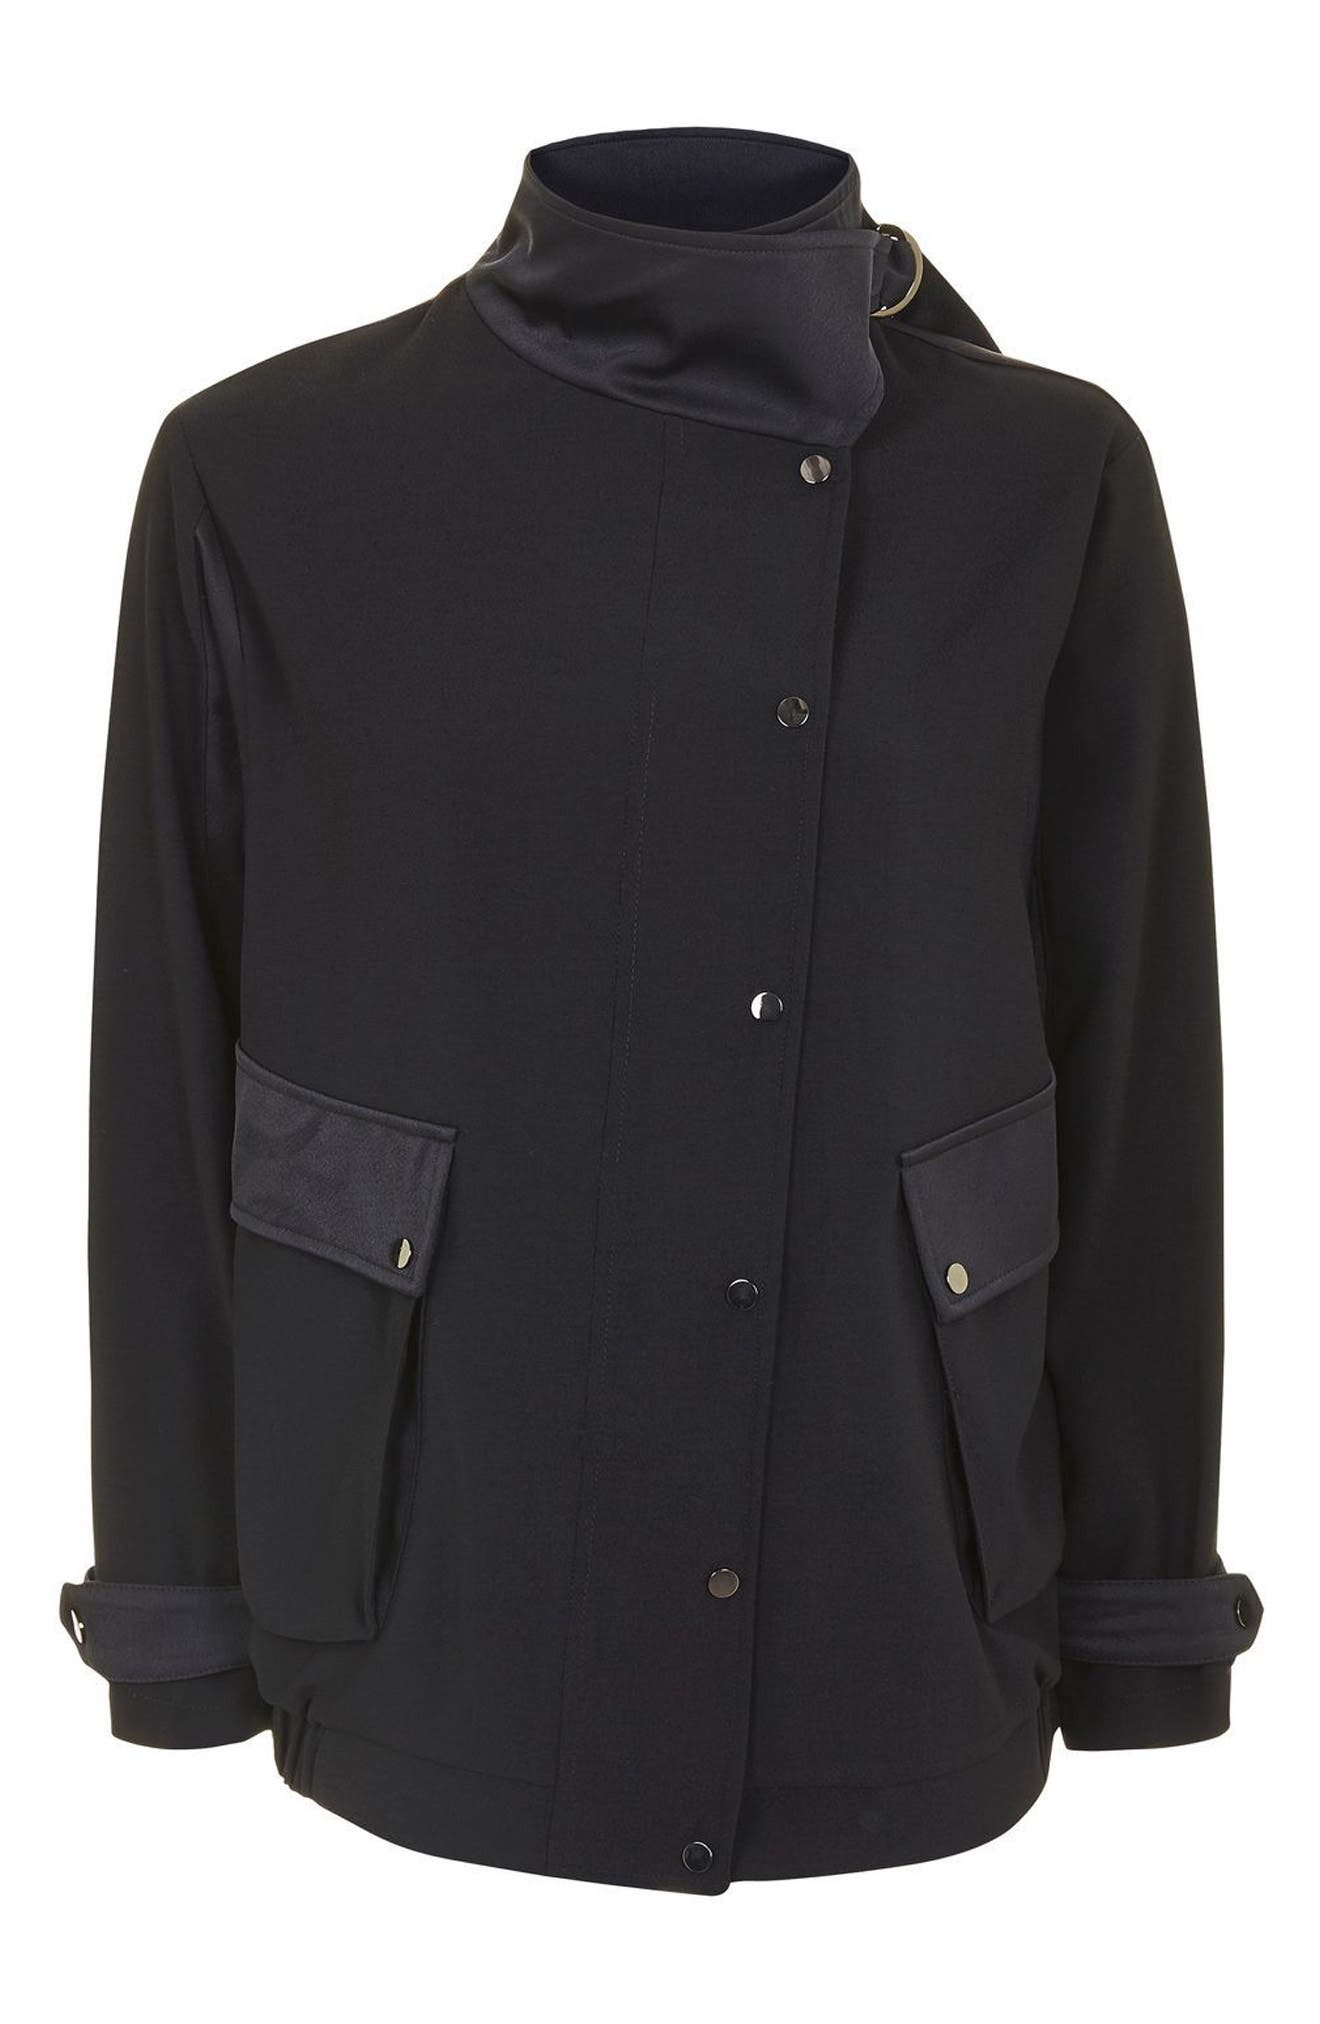 Urban Popper Jacket,                             Alternate thumbnail 4, color,                             410